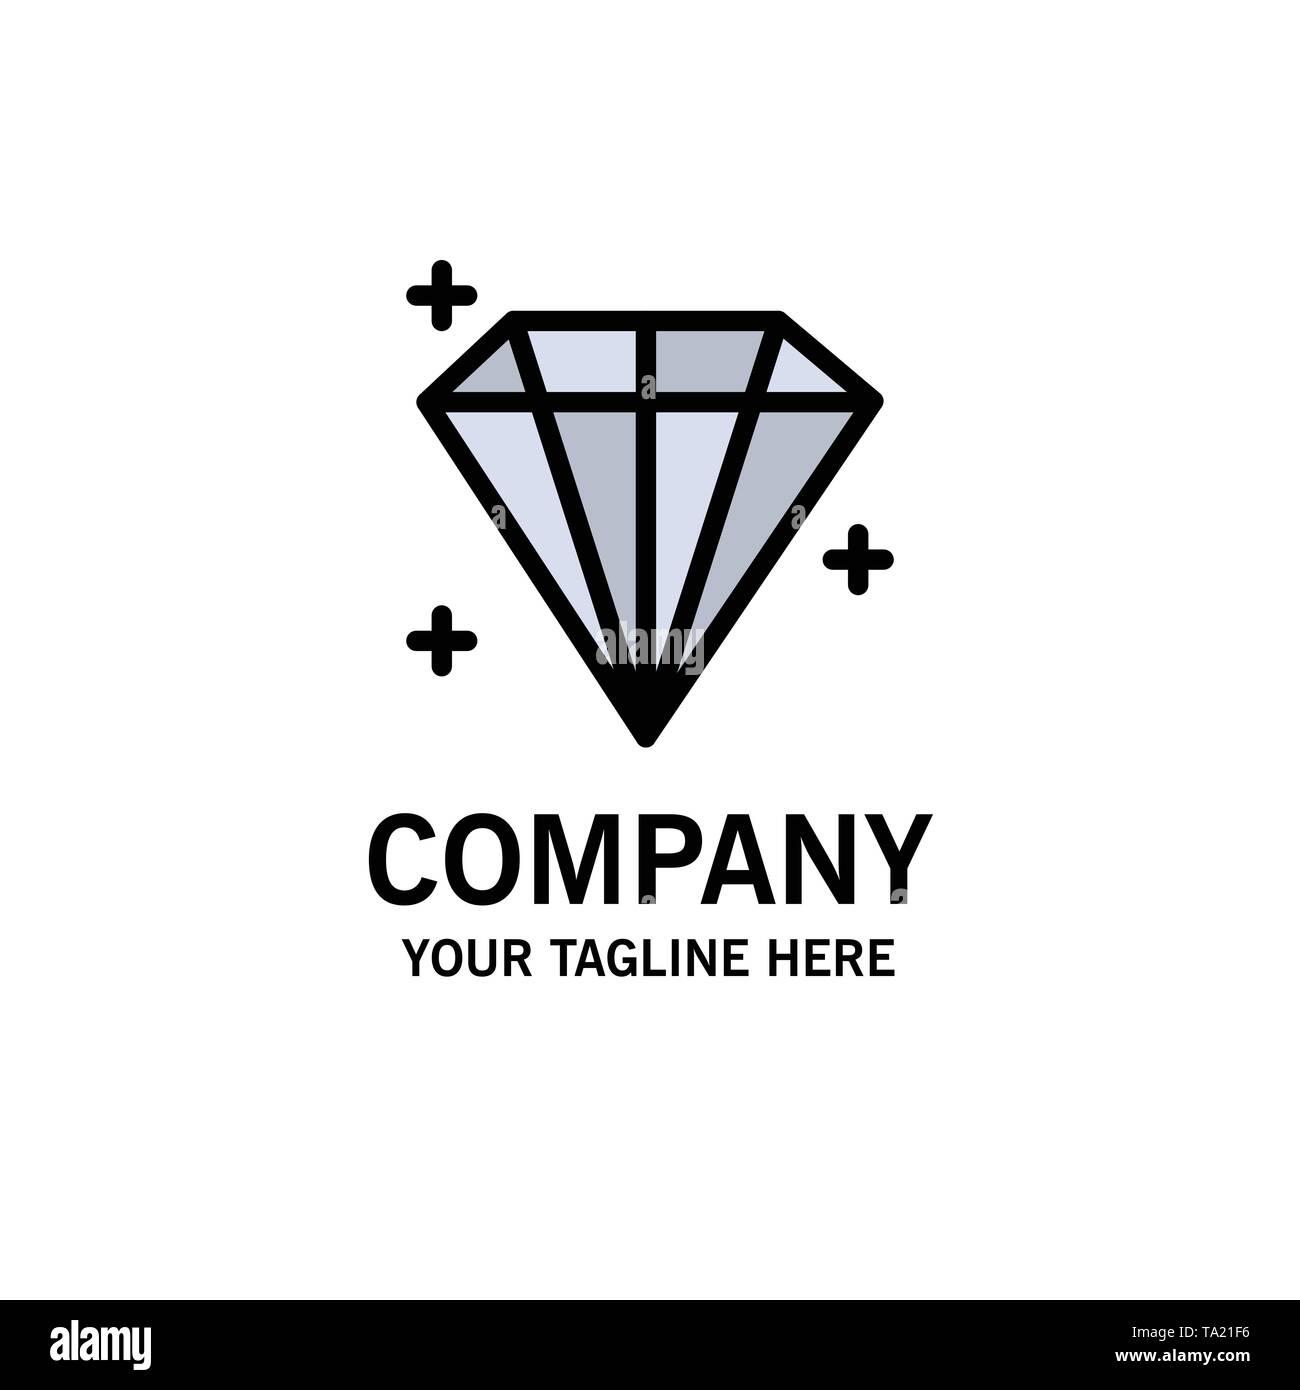 Diamond, Jewel, User Business Logo Template. Flat Color - Stock Image